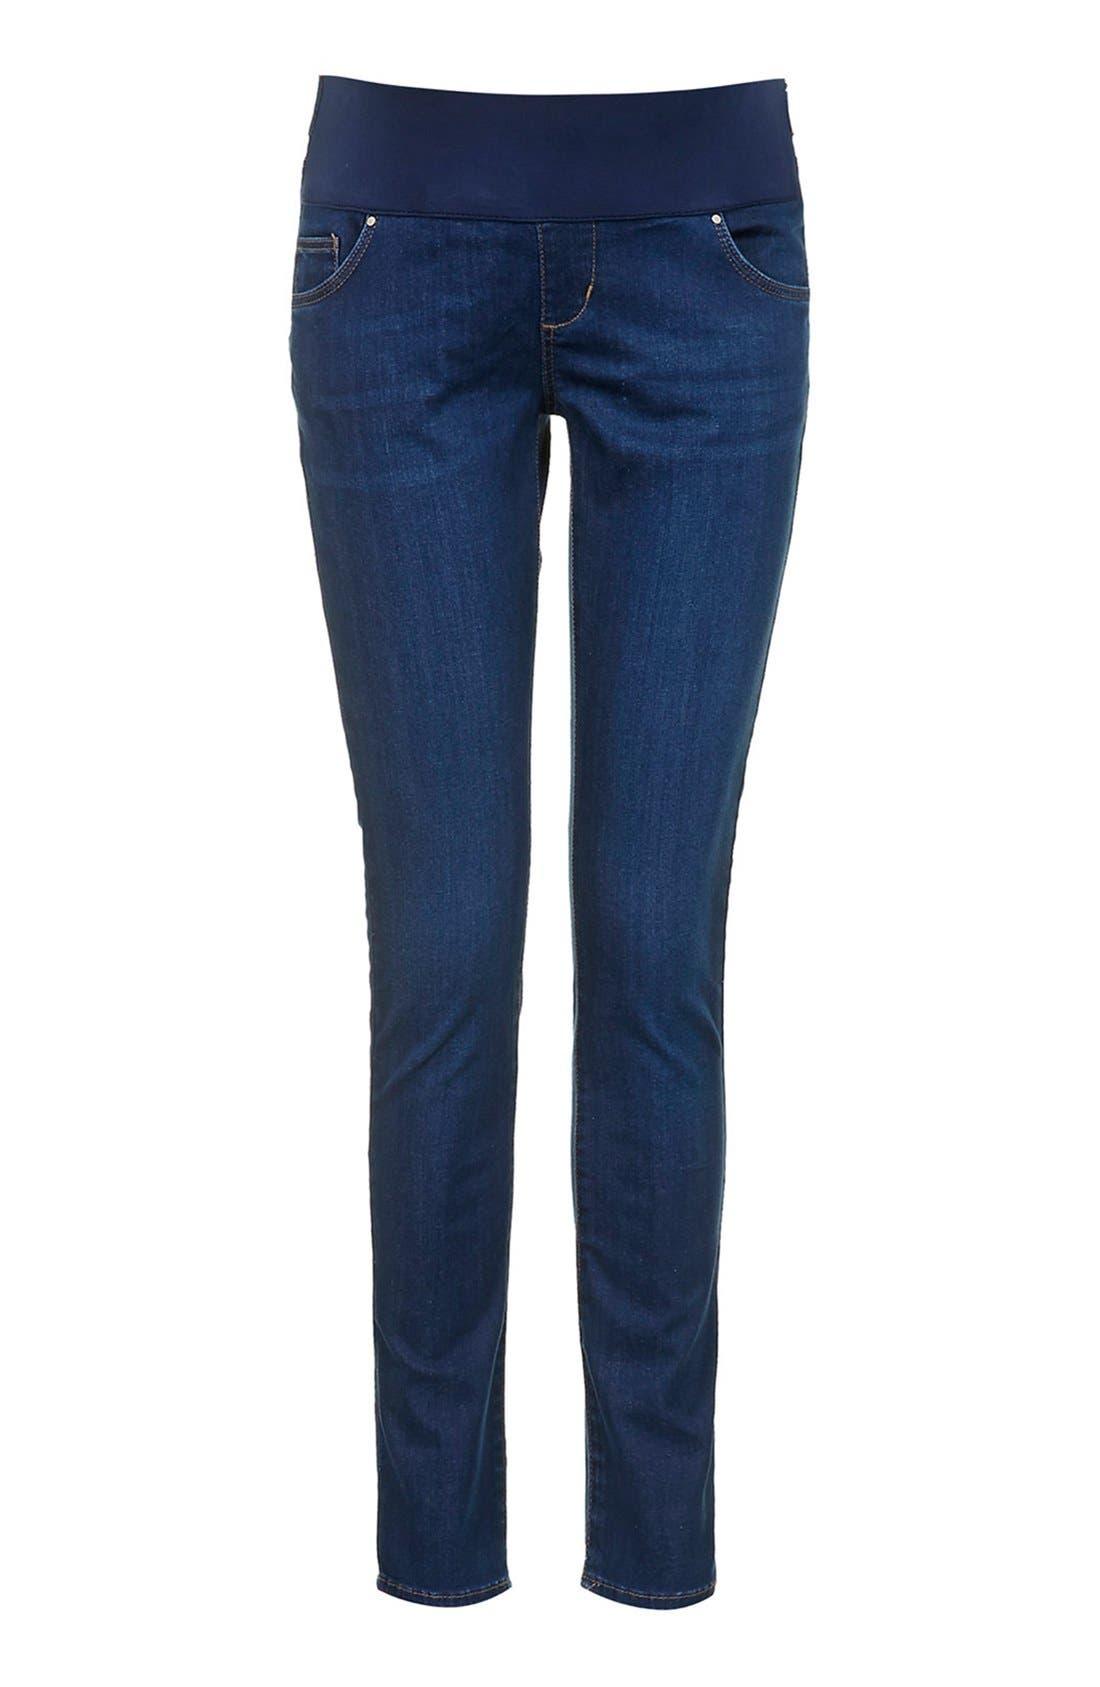 Alternate Image 3  - Topshop Moto 'Leigh' Maternity Skinny Jeans (Regular & Short)